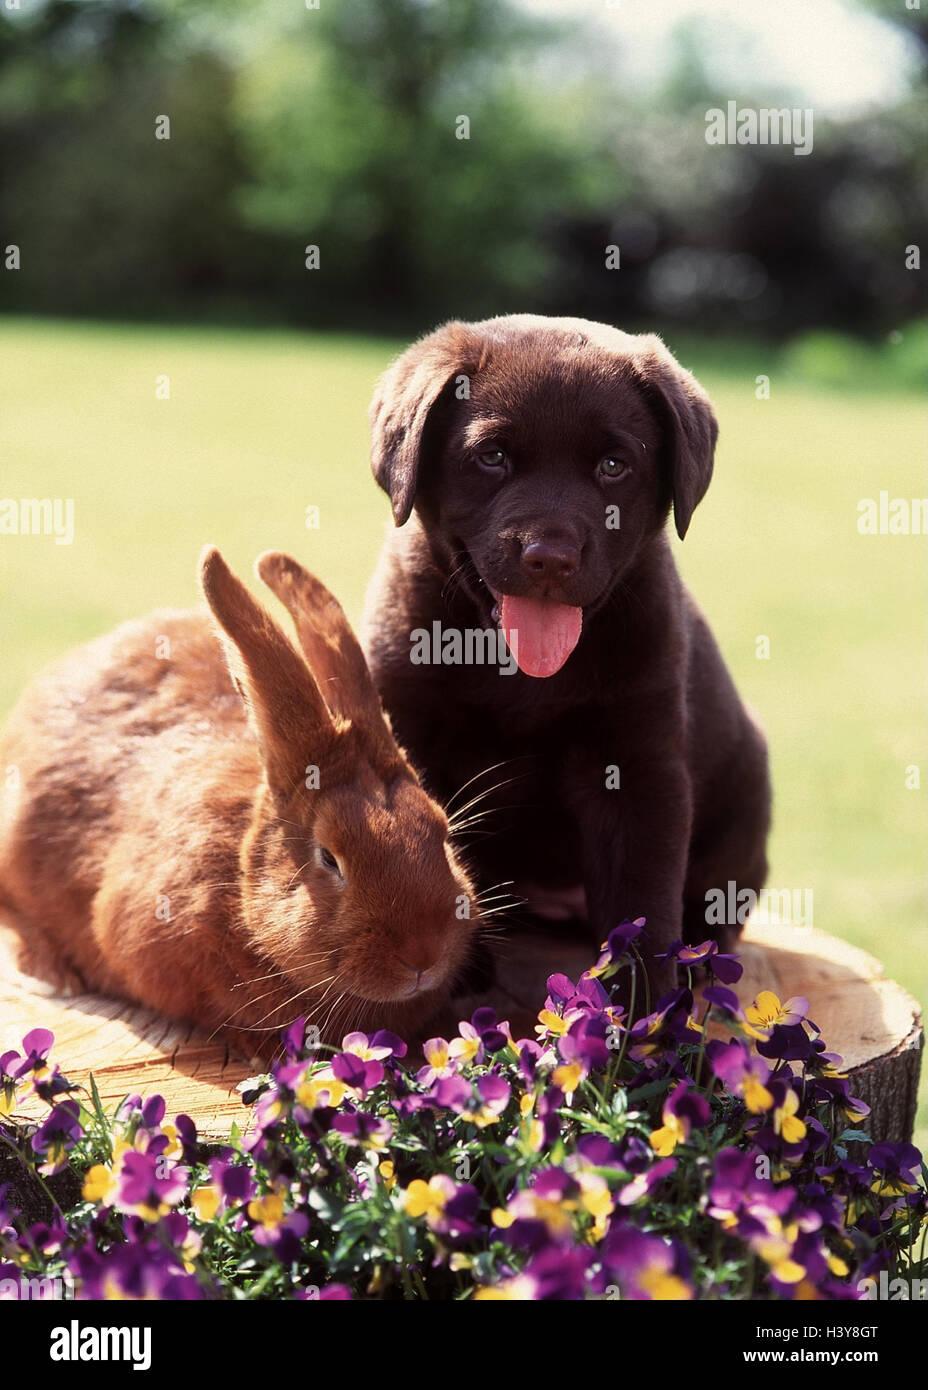 Garden, tree stump, rabbit, Labrador, young, sit, hatchel park, meadow, flowers, animals, pets, hare, Kanickel, - Stock Image